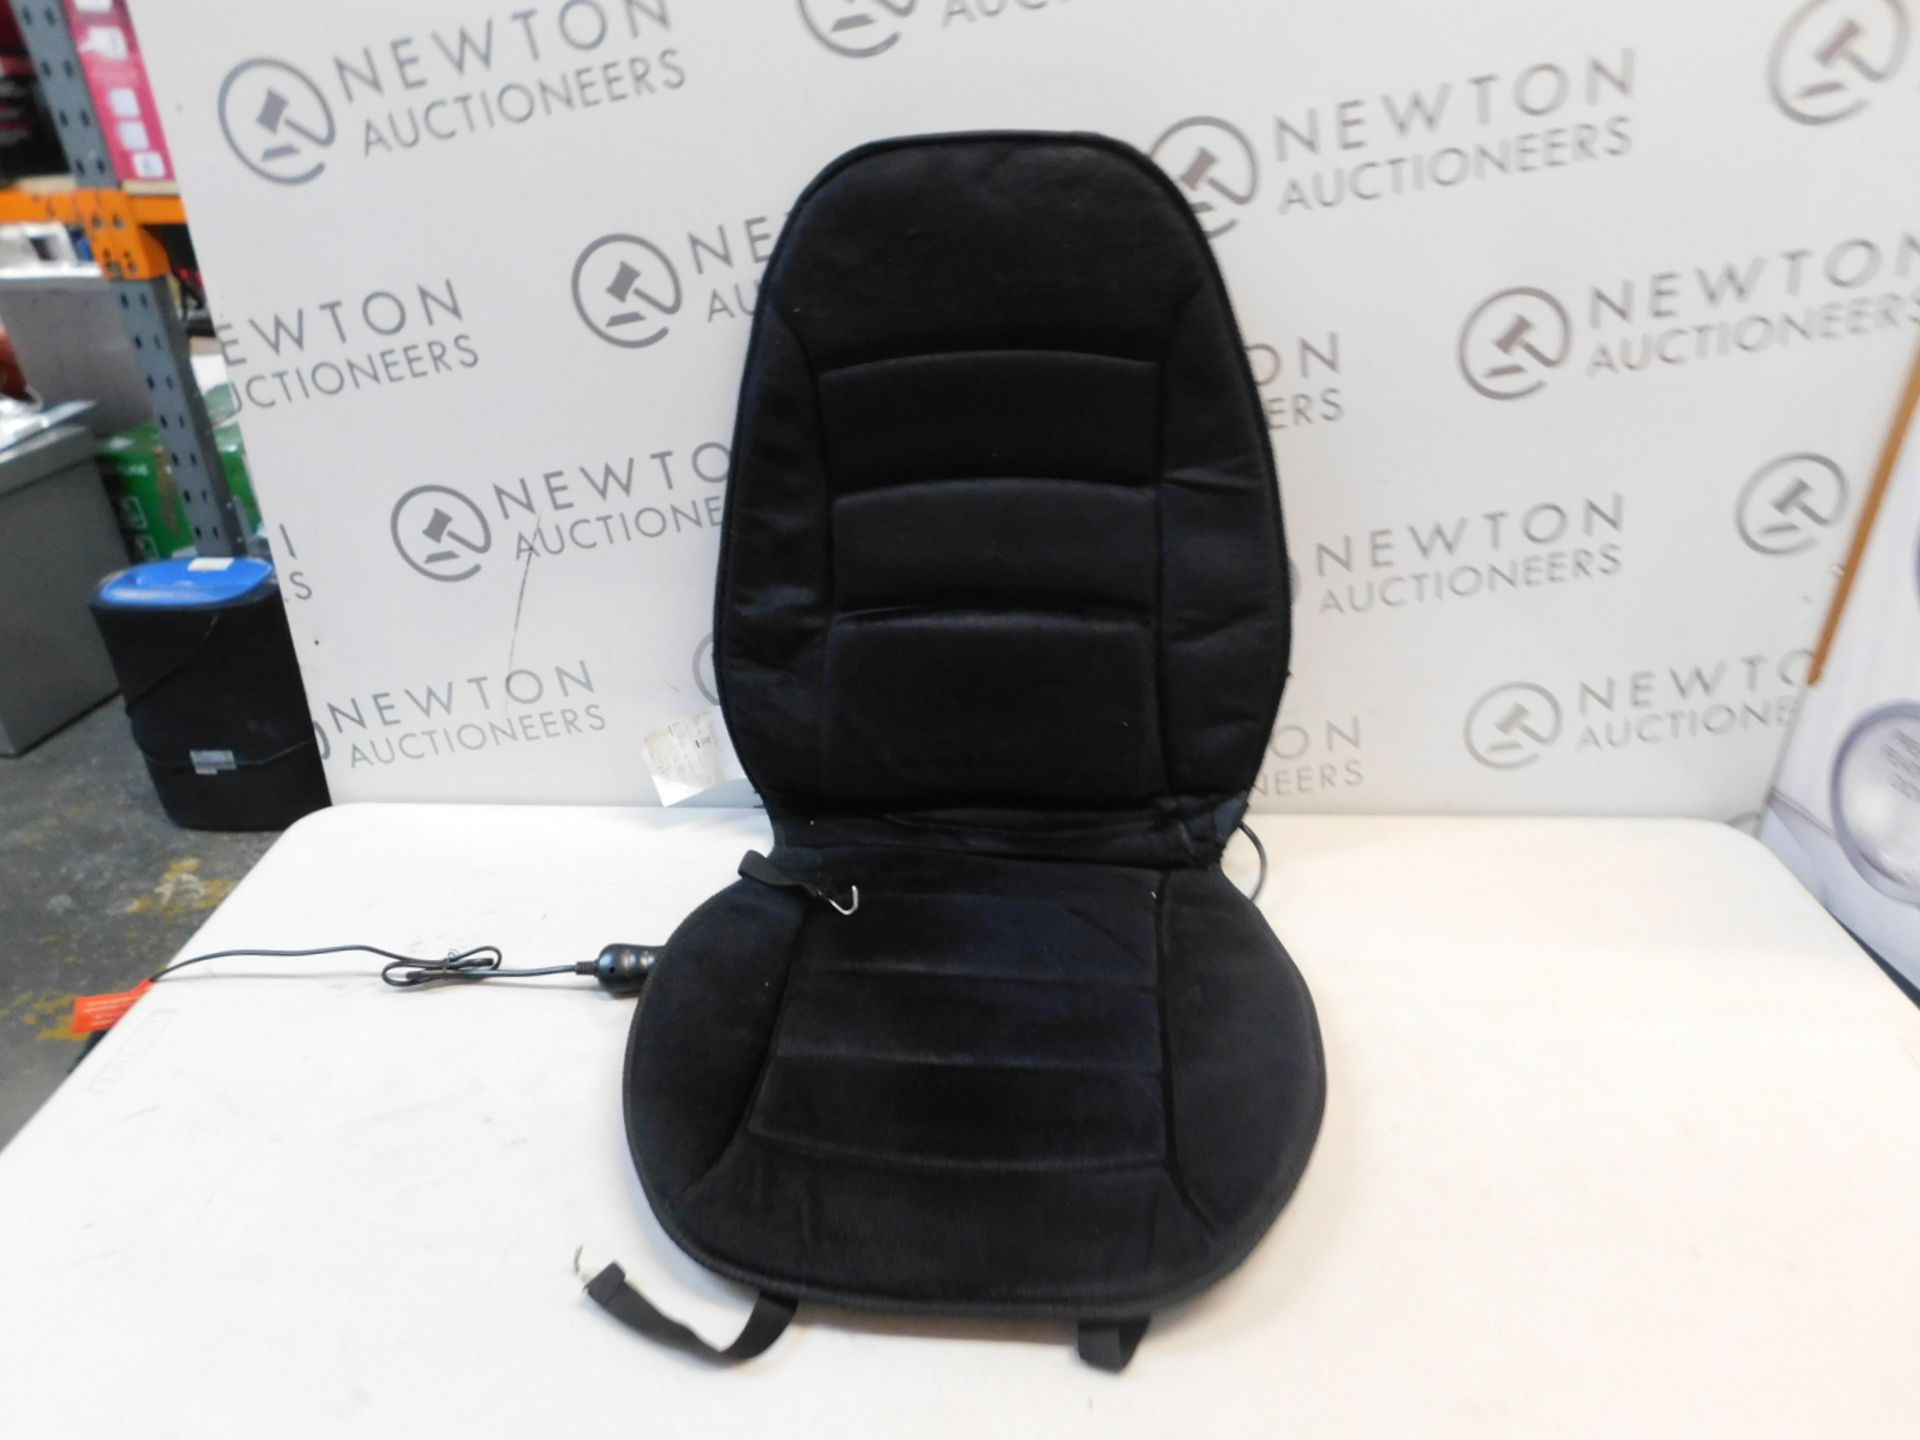 1 HEALTHMATE HEATED SEAT CUSHION RRP £29.99